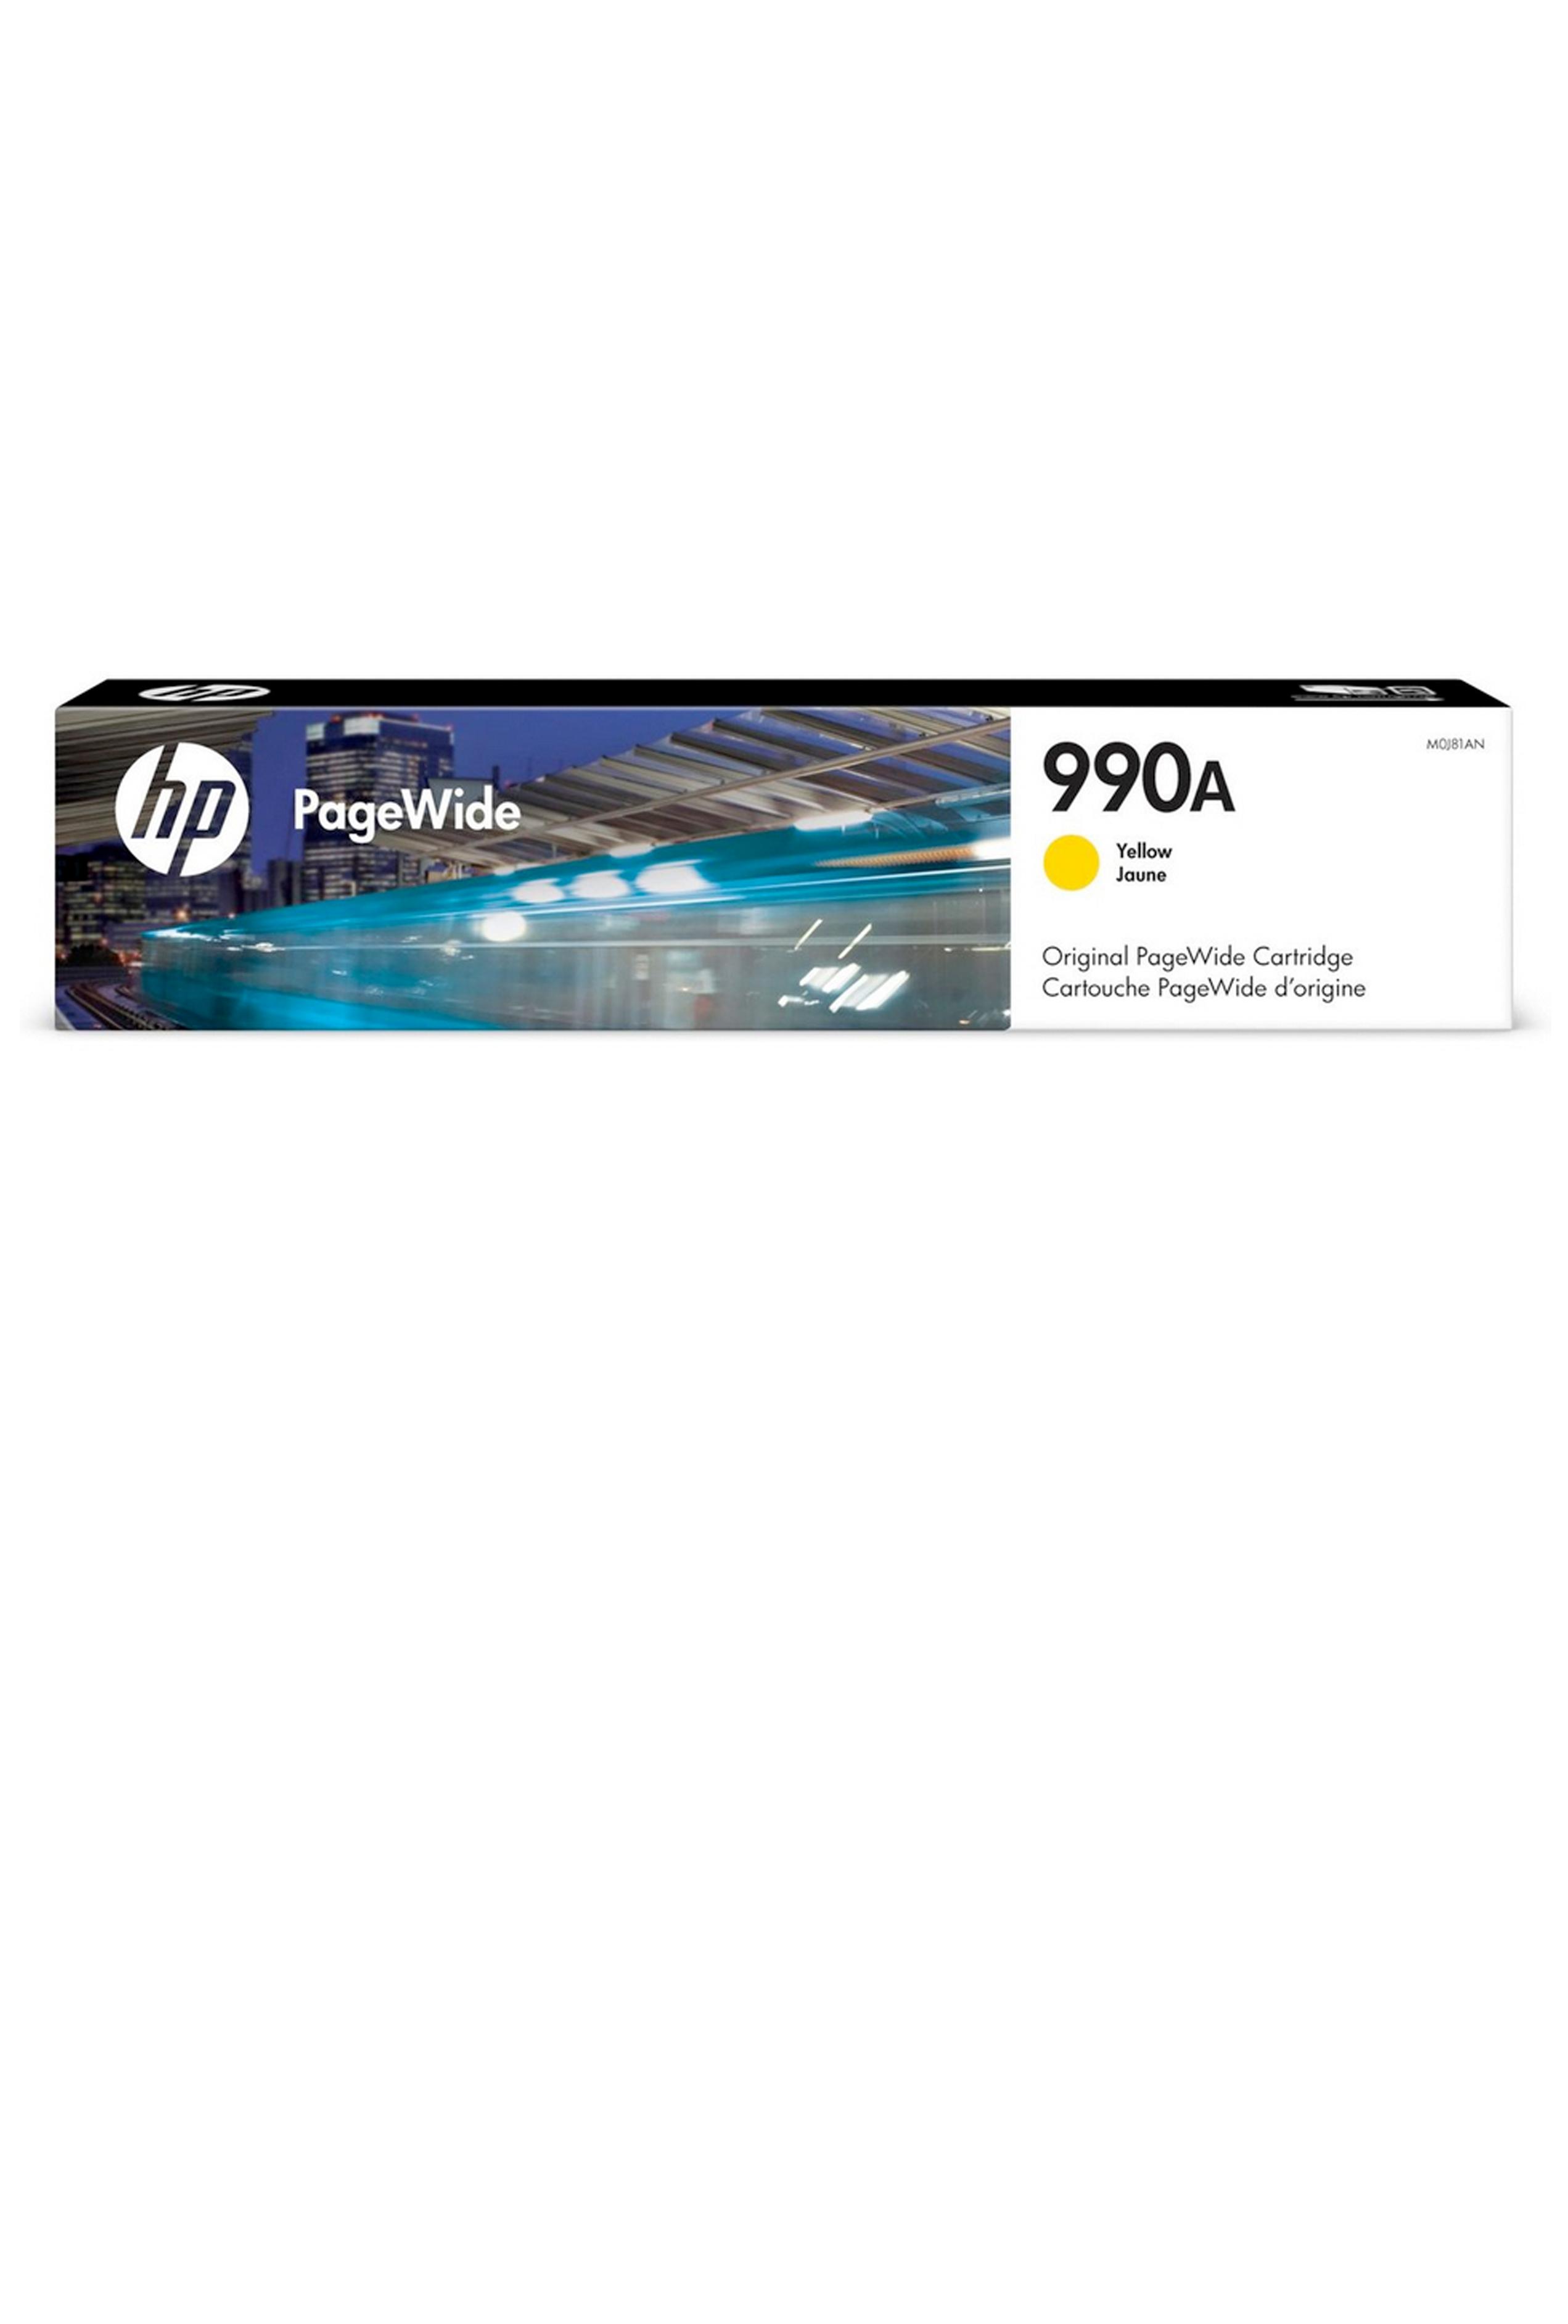 HP Cyan Original Ink Cartridge for US Government (6.6K) (D8J07AG)